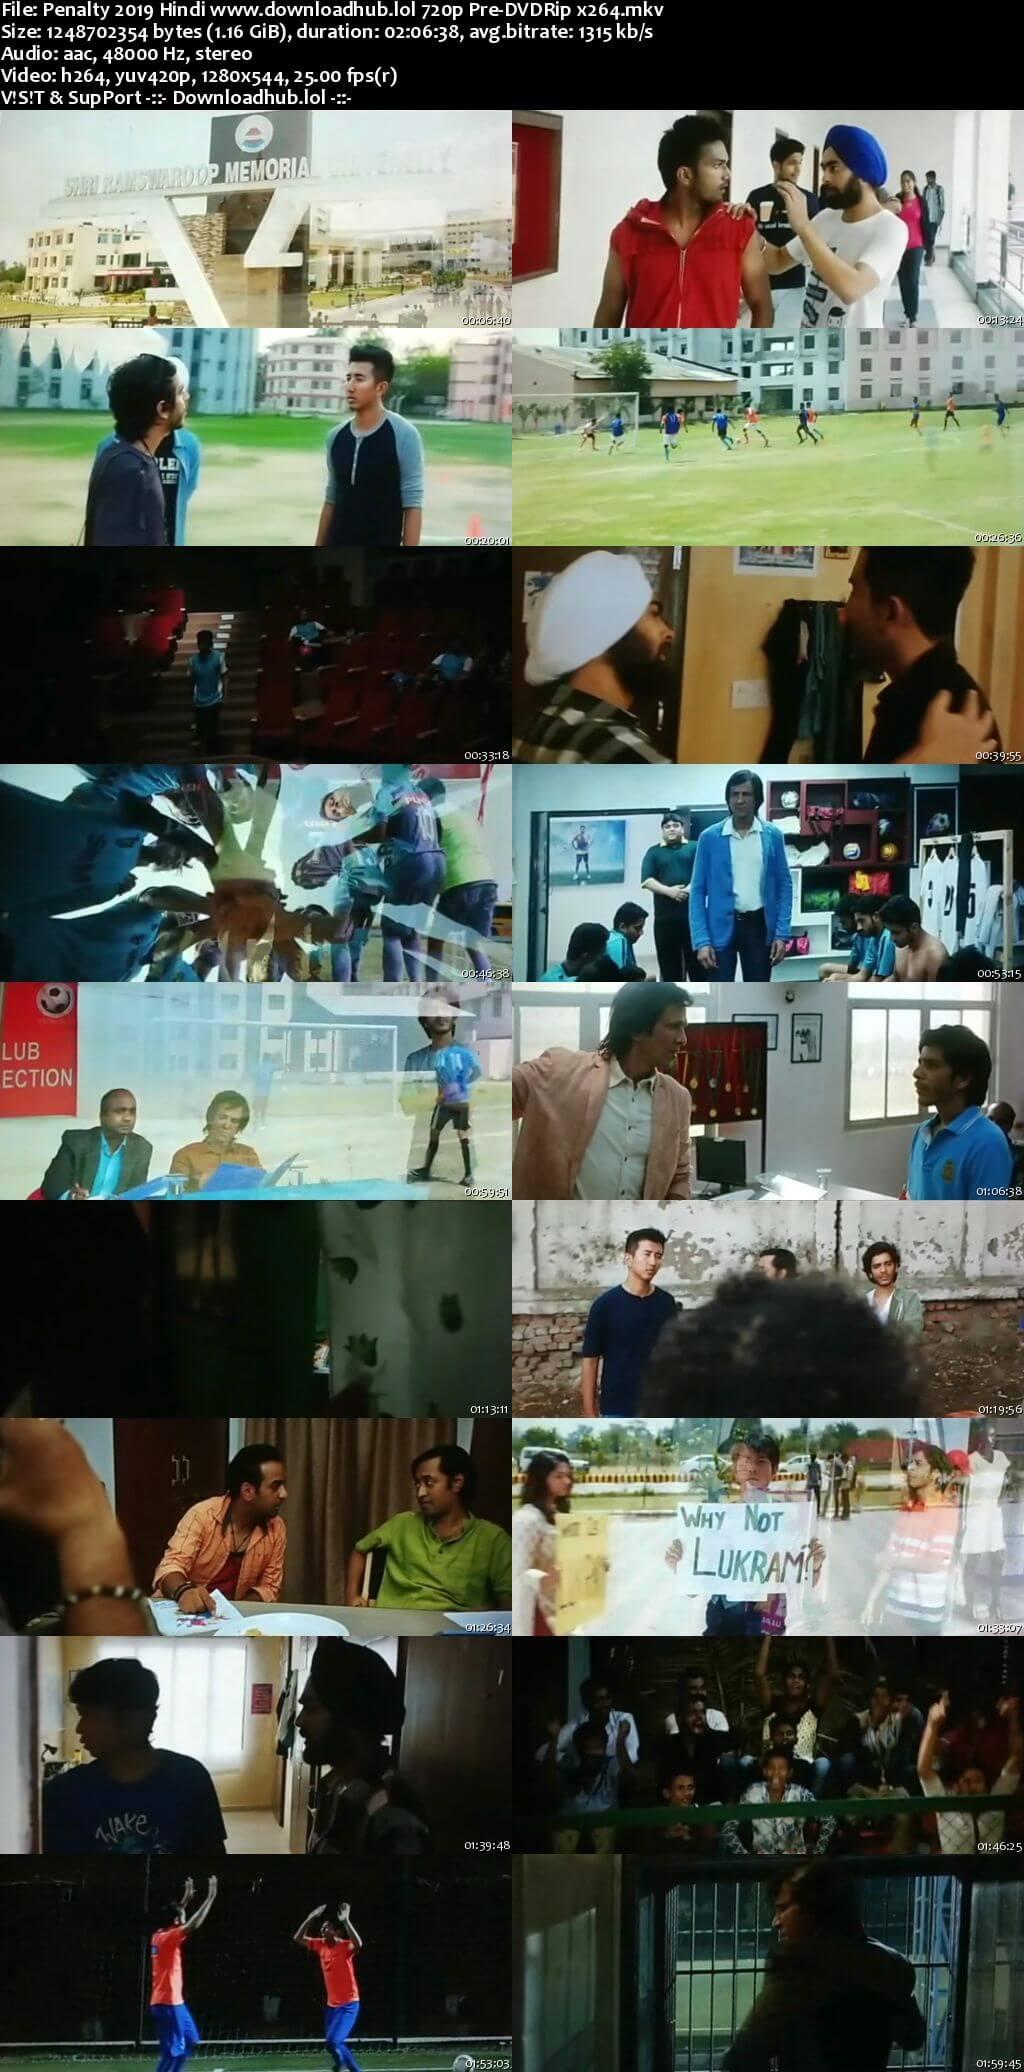 Penalty 2019 Hindi 720p Pre-DVDRip x264